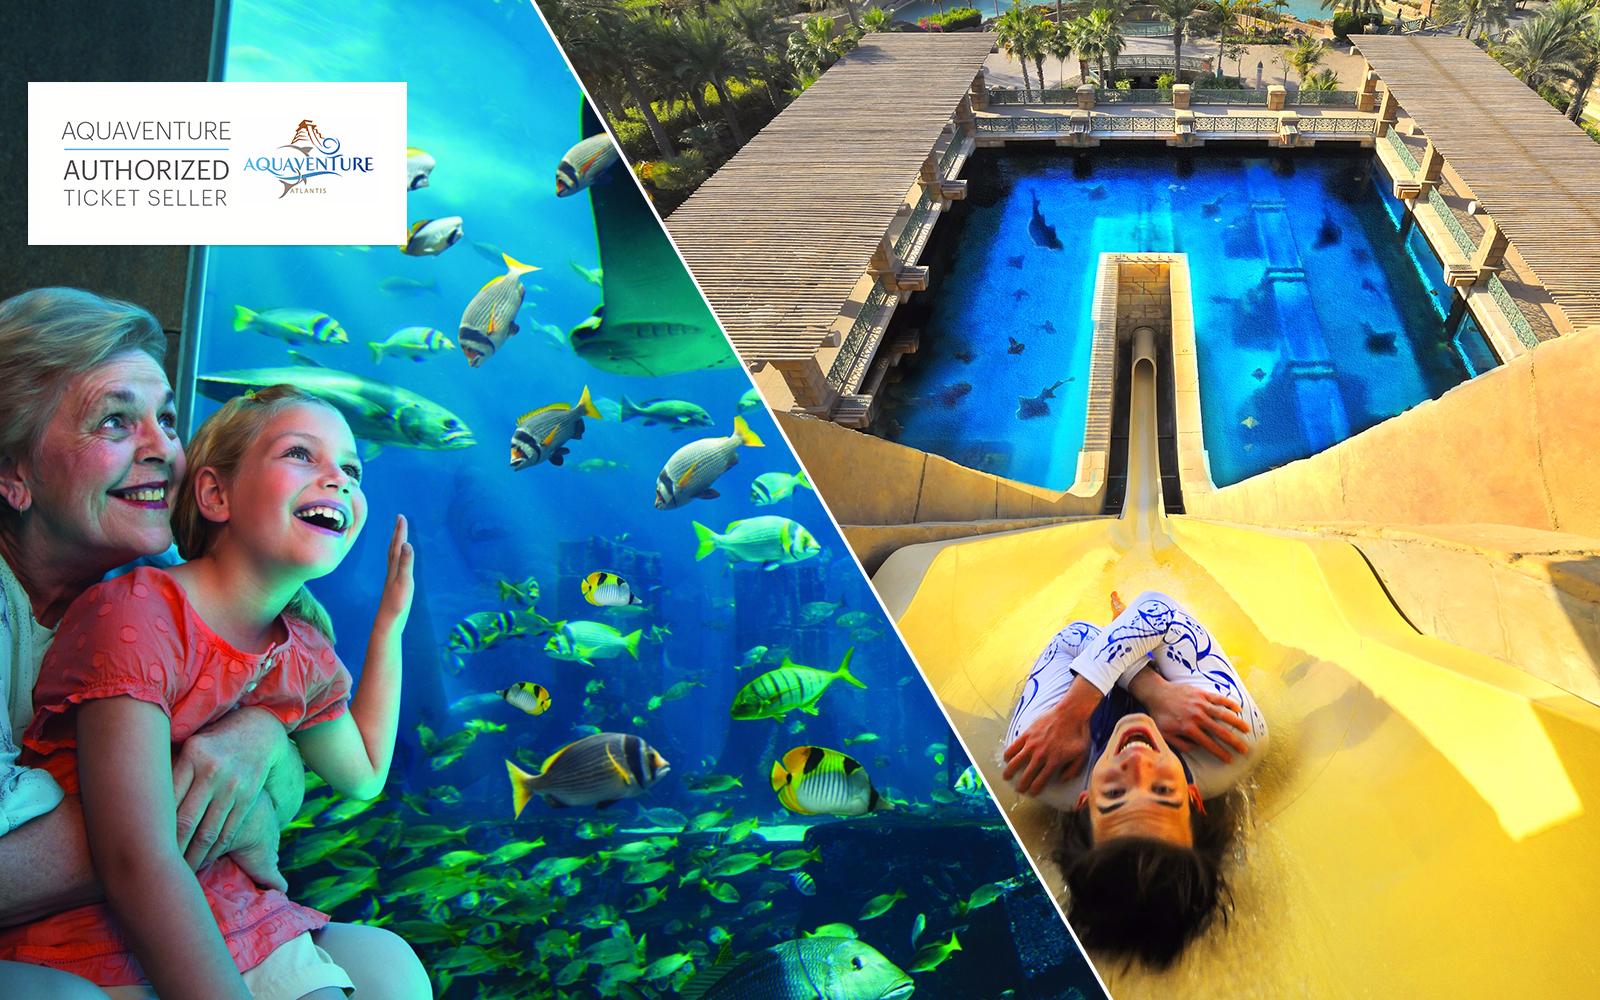 Aquaventure Waterpark Tickets Best Prices Online On Headout